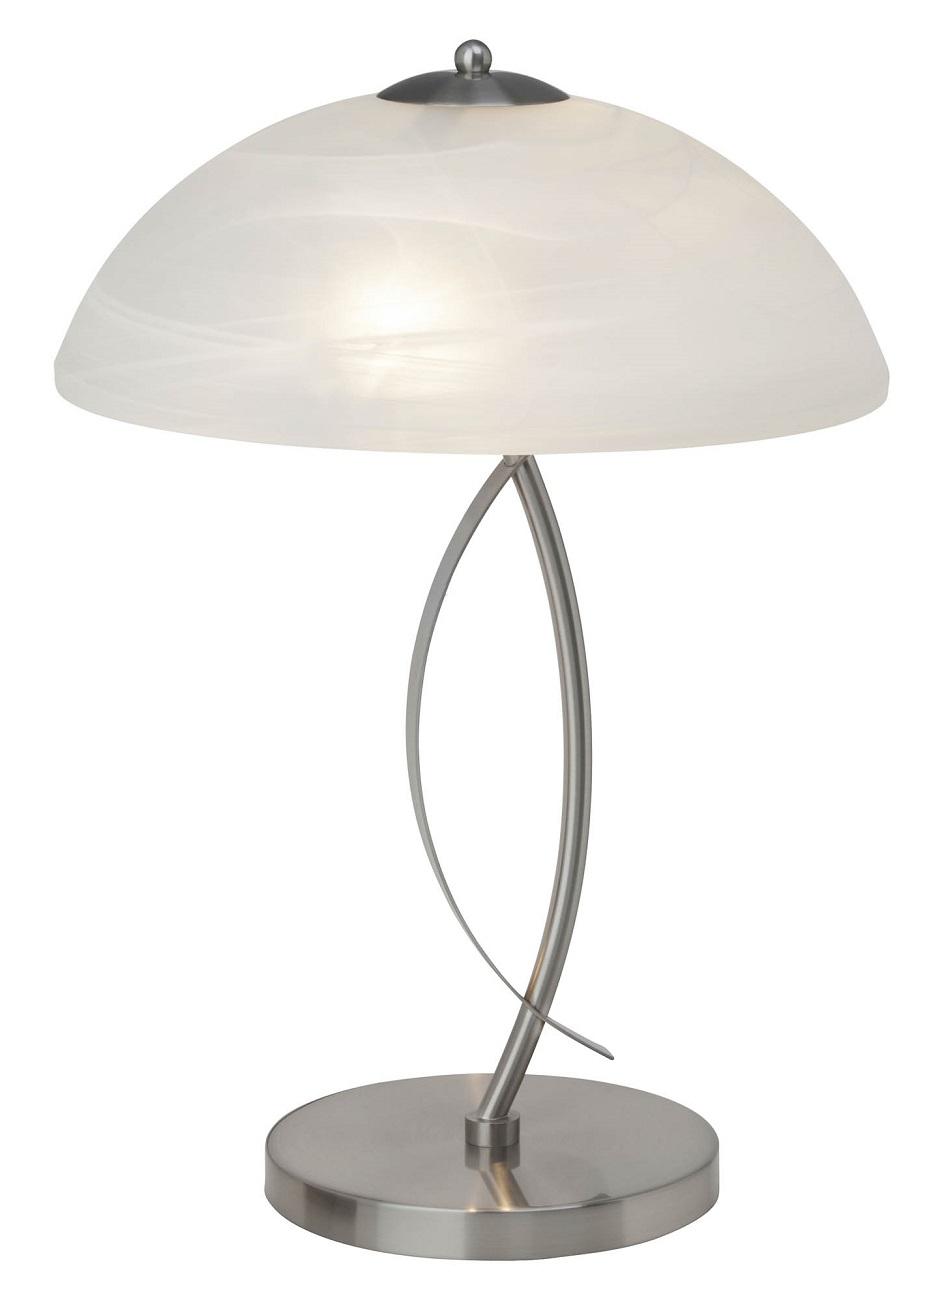 Tafellamp Baston 2xE14 max 40Watt in chroom met wit